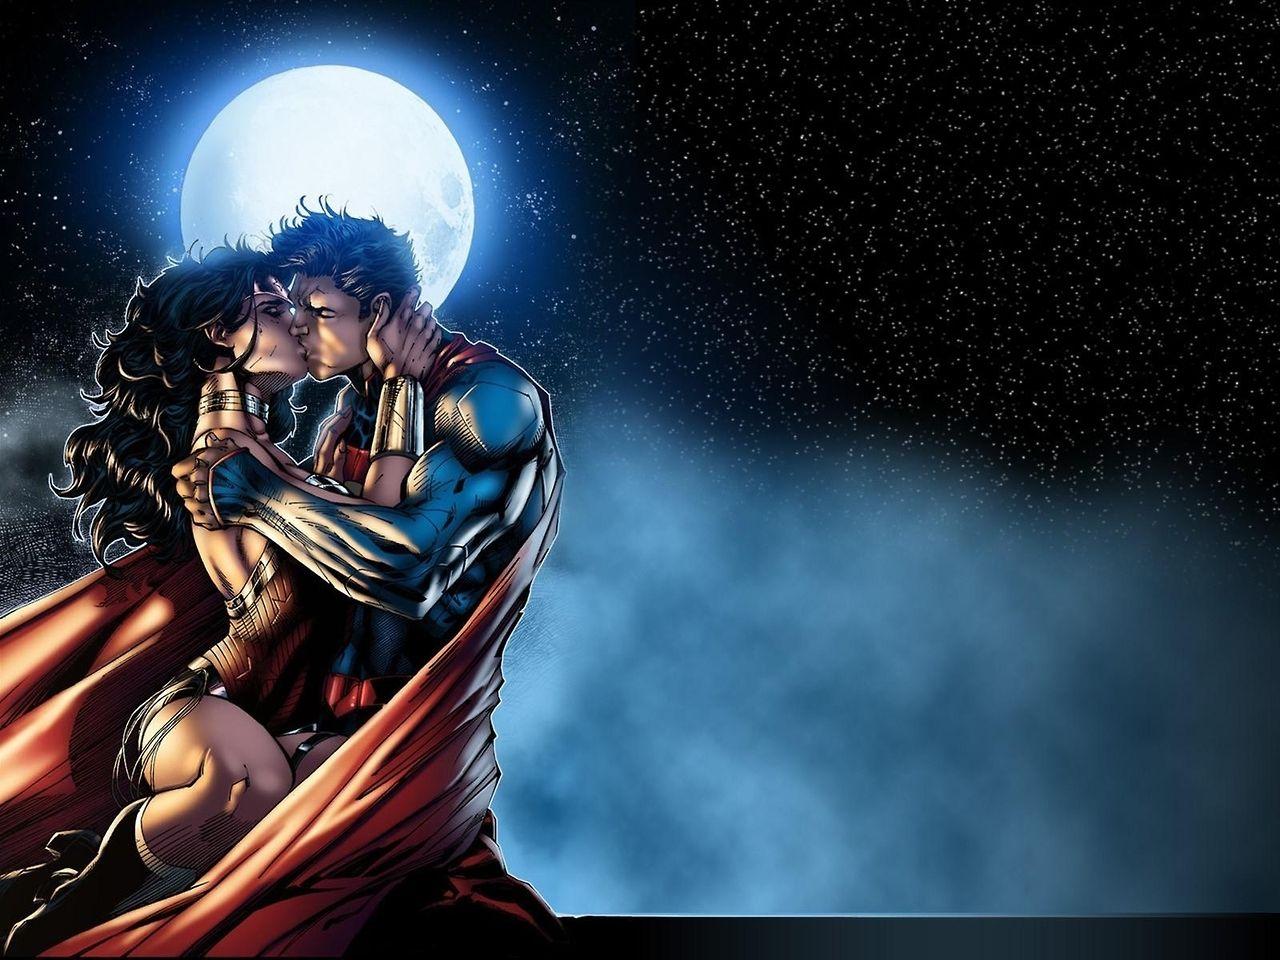 Wallpaper of the Superman Wonder Woman kiss by DC artist